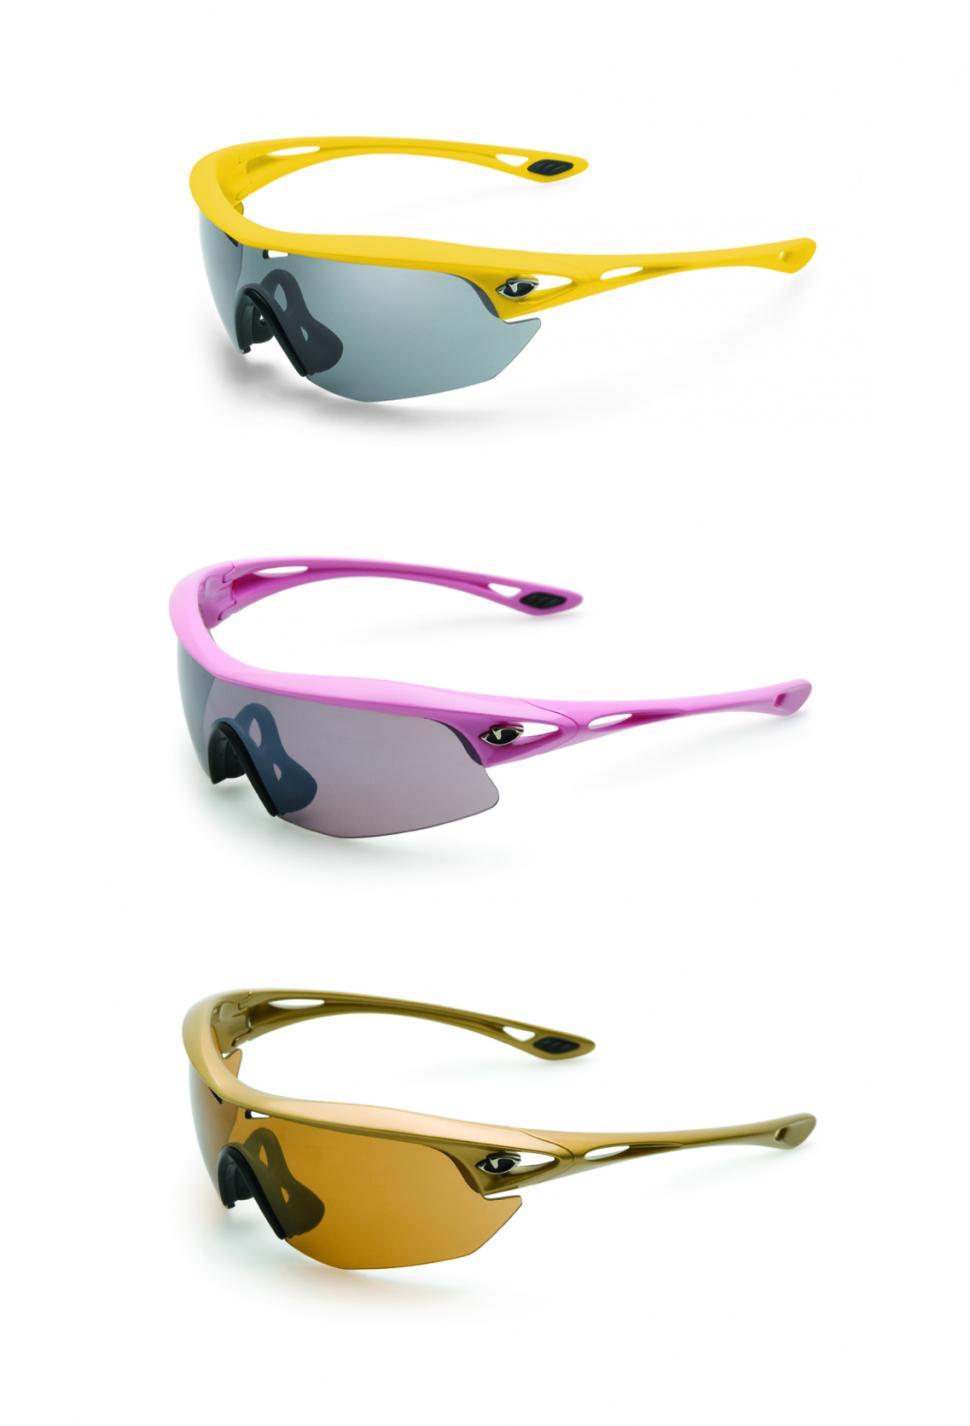 Havik Limited edition glasses